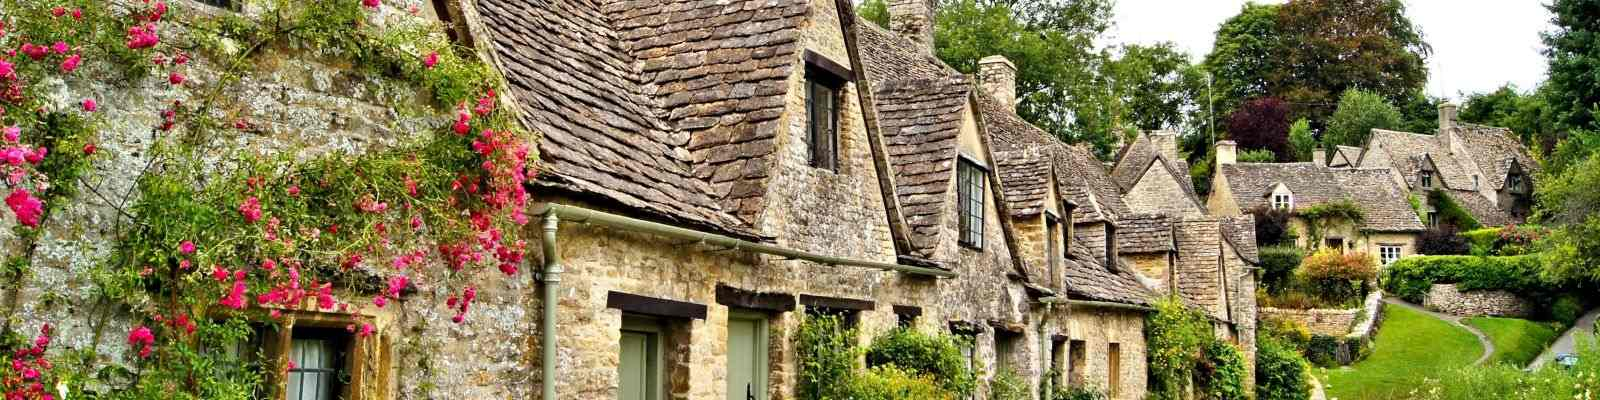 Super Cottage Holidays And Short Breaks In Central England No Home Interior And Landscaping Mentranervesignezvosmurscom